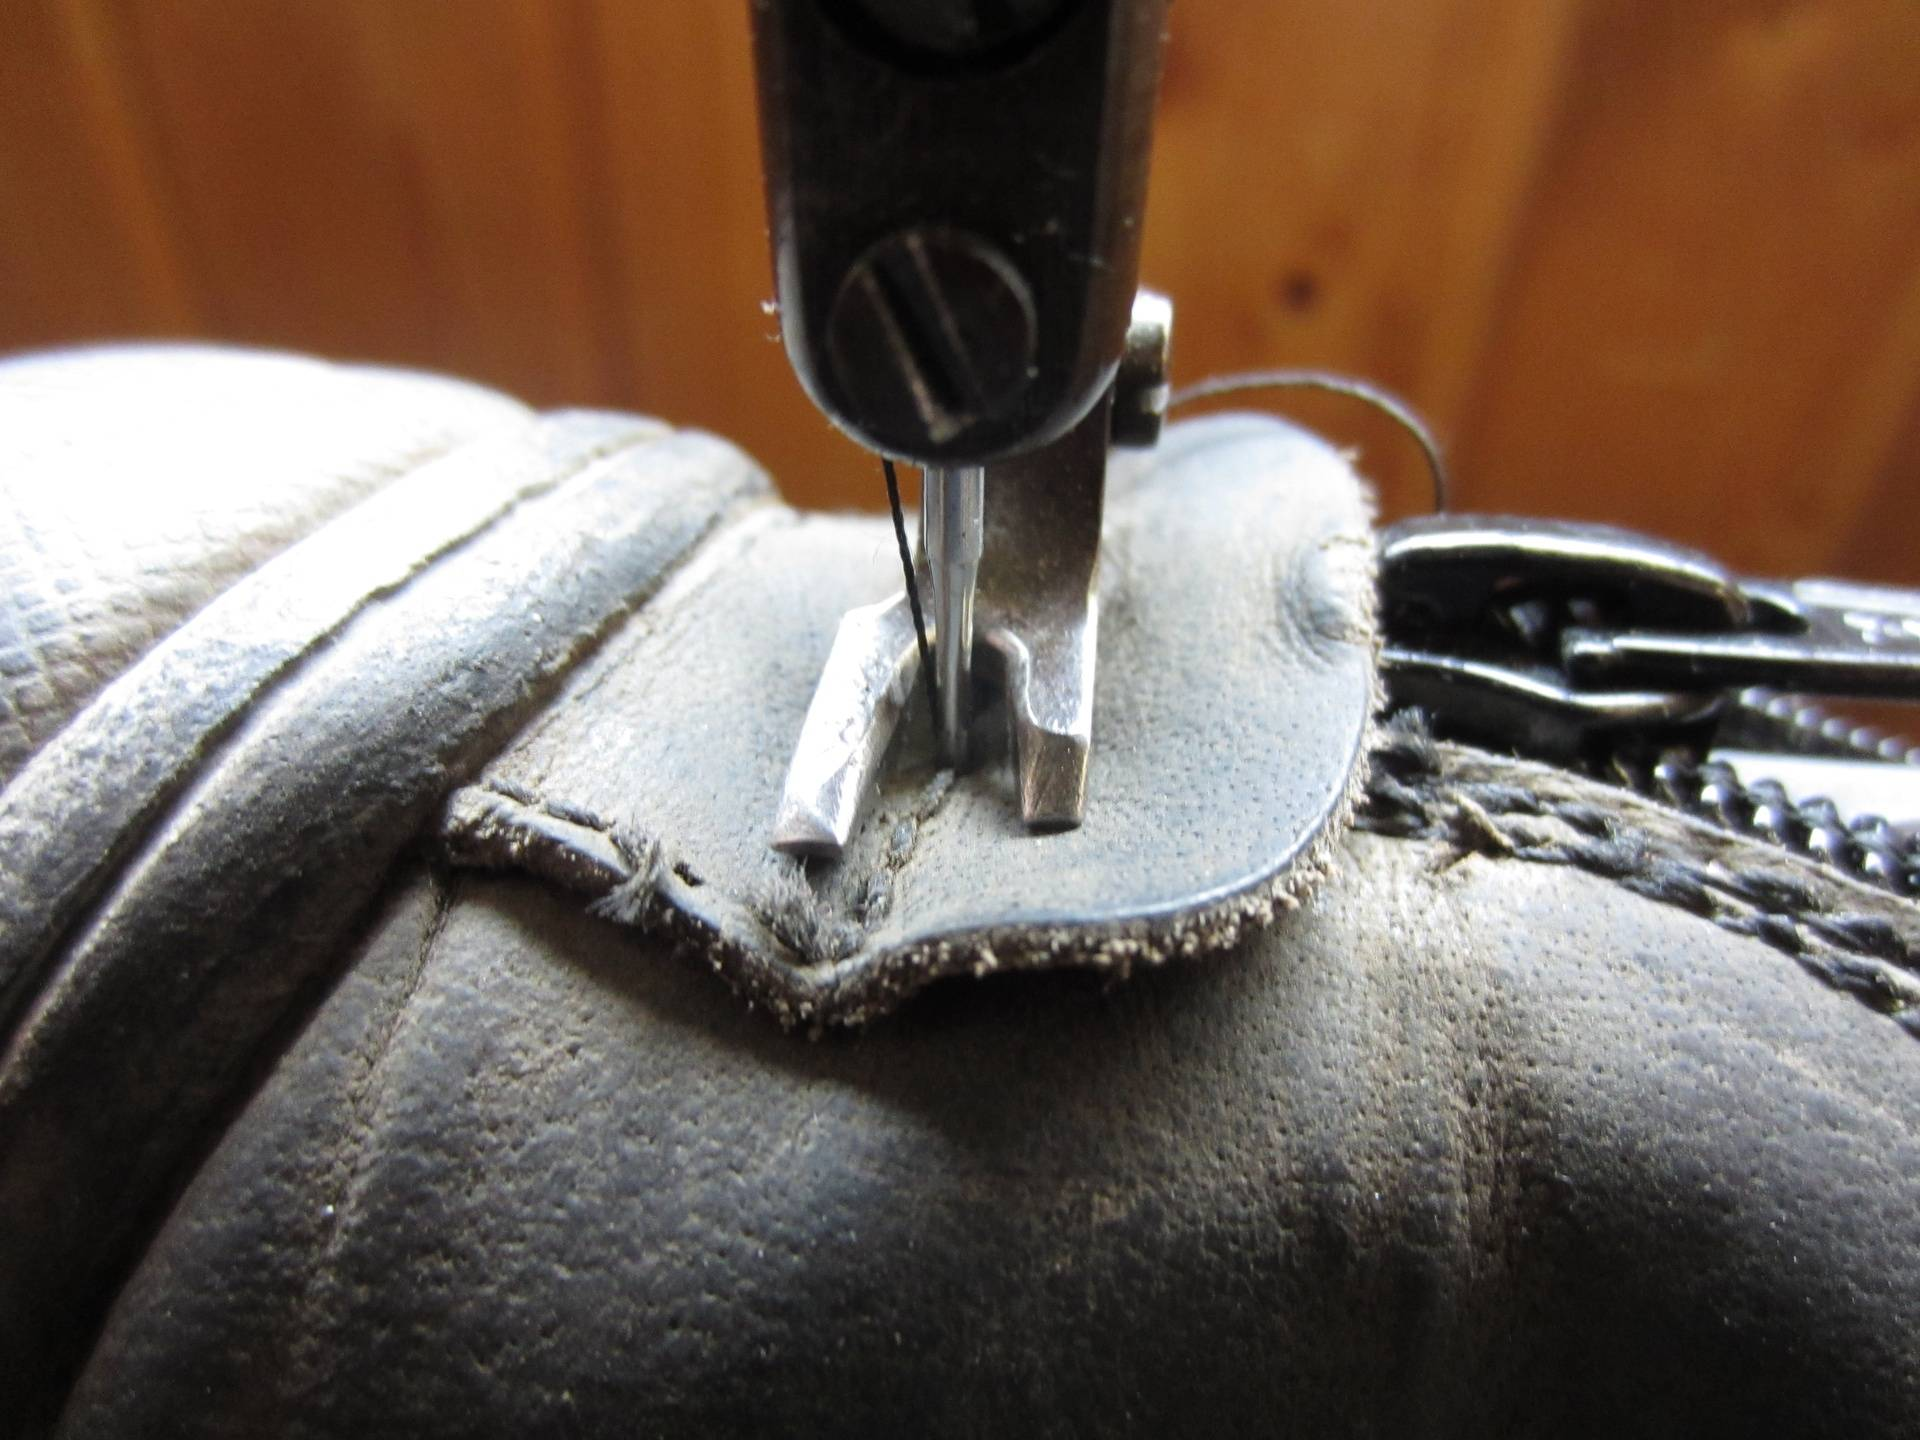 Stitch bottom tab and then stitch the restof zip int boot